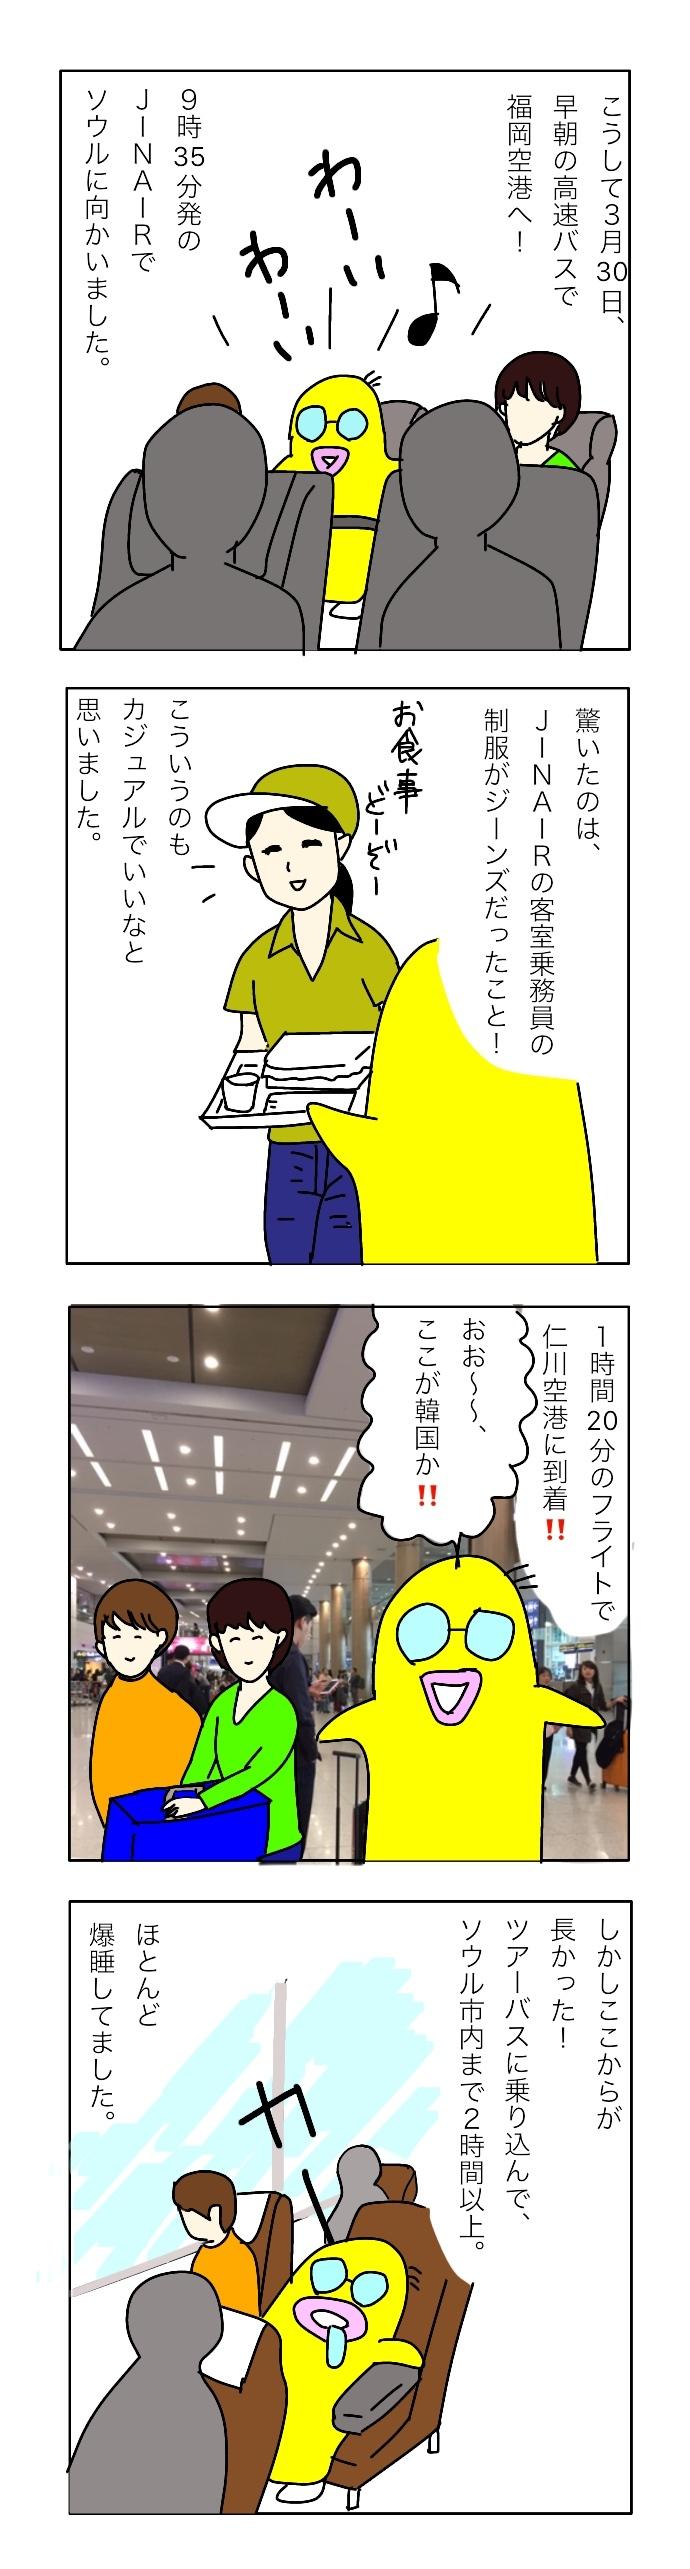 kankoku2 空港